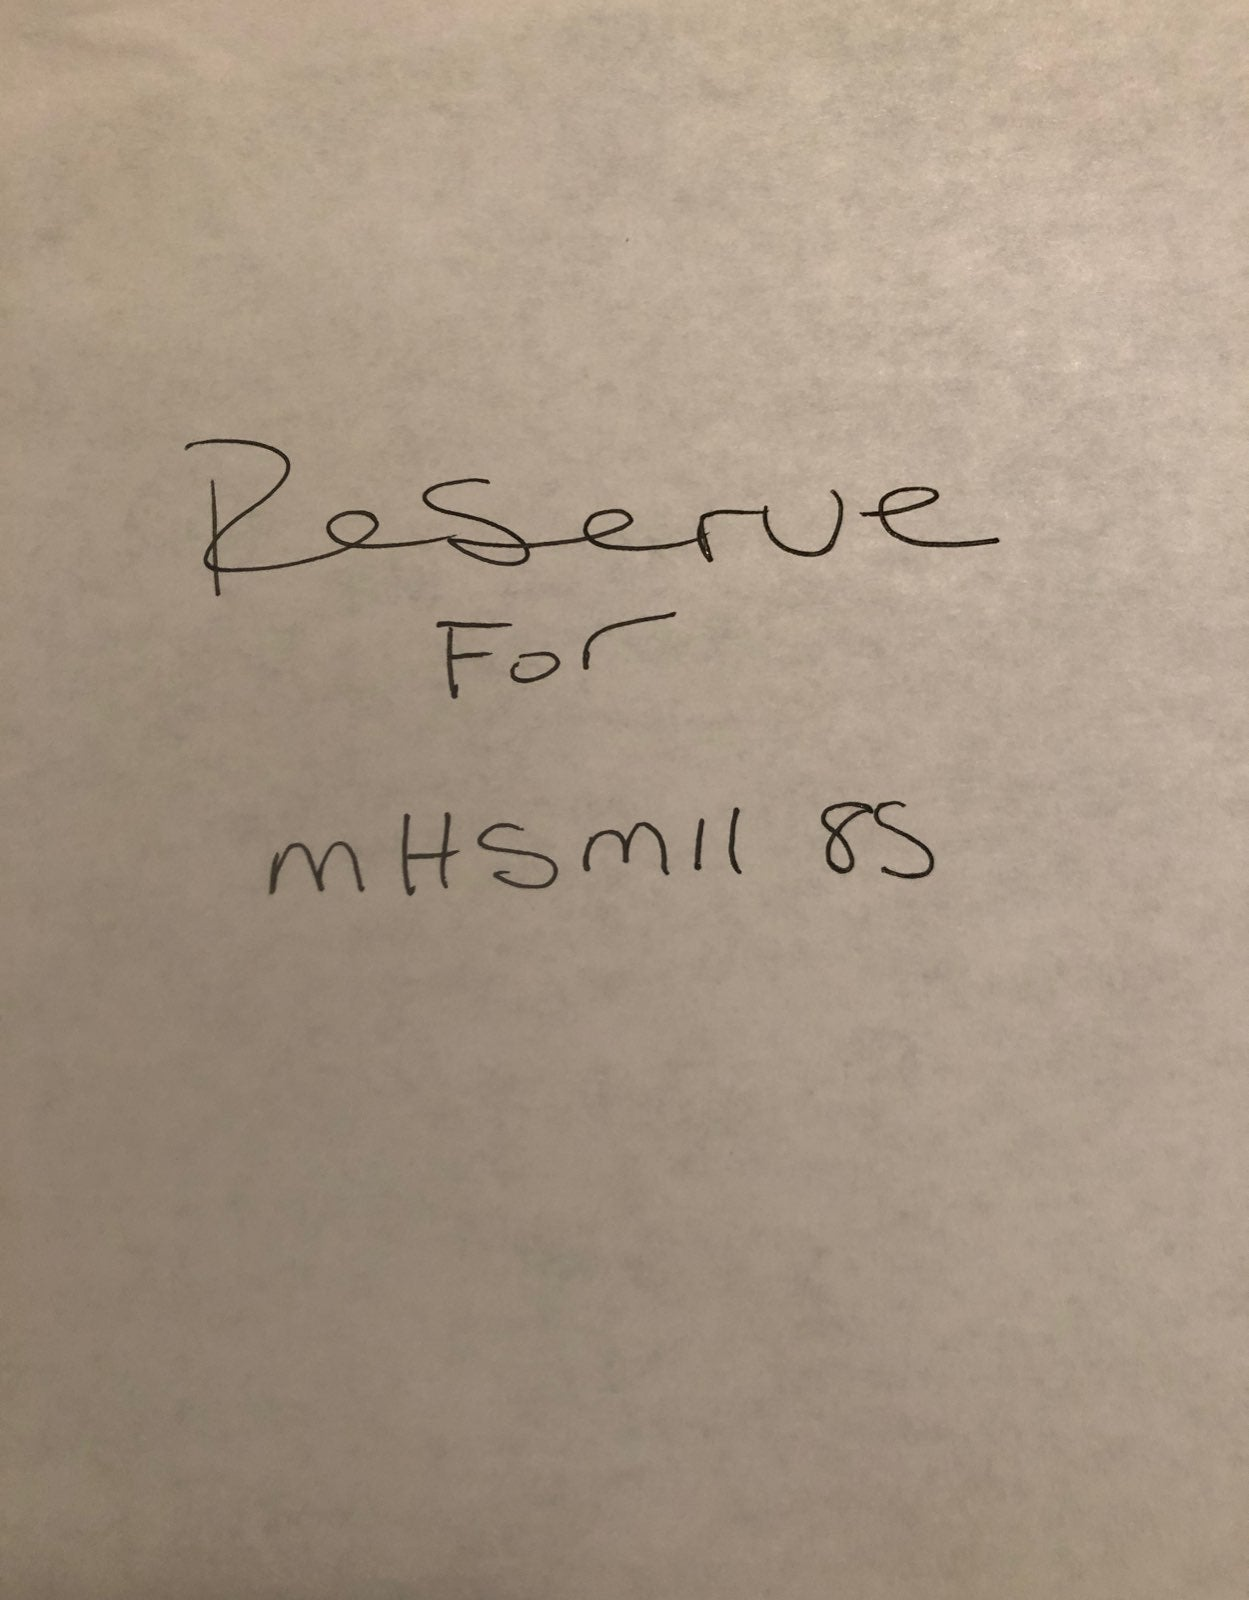 Bundle for mhsmll85